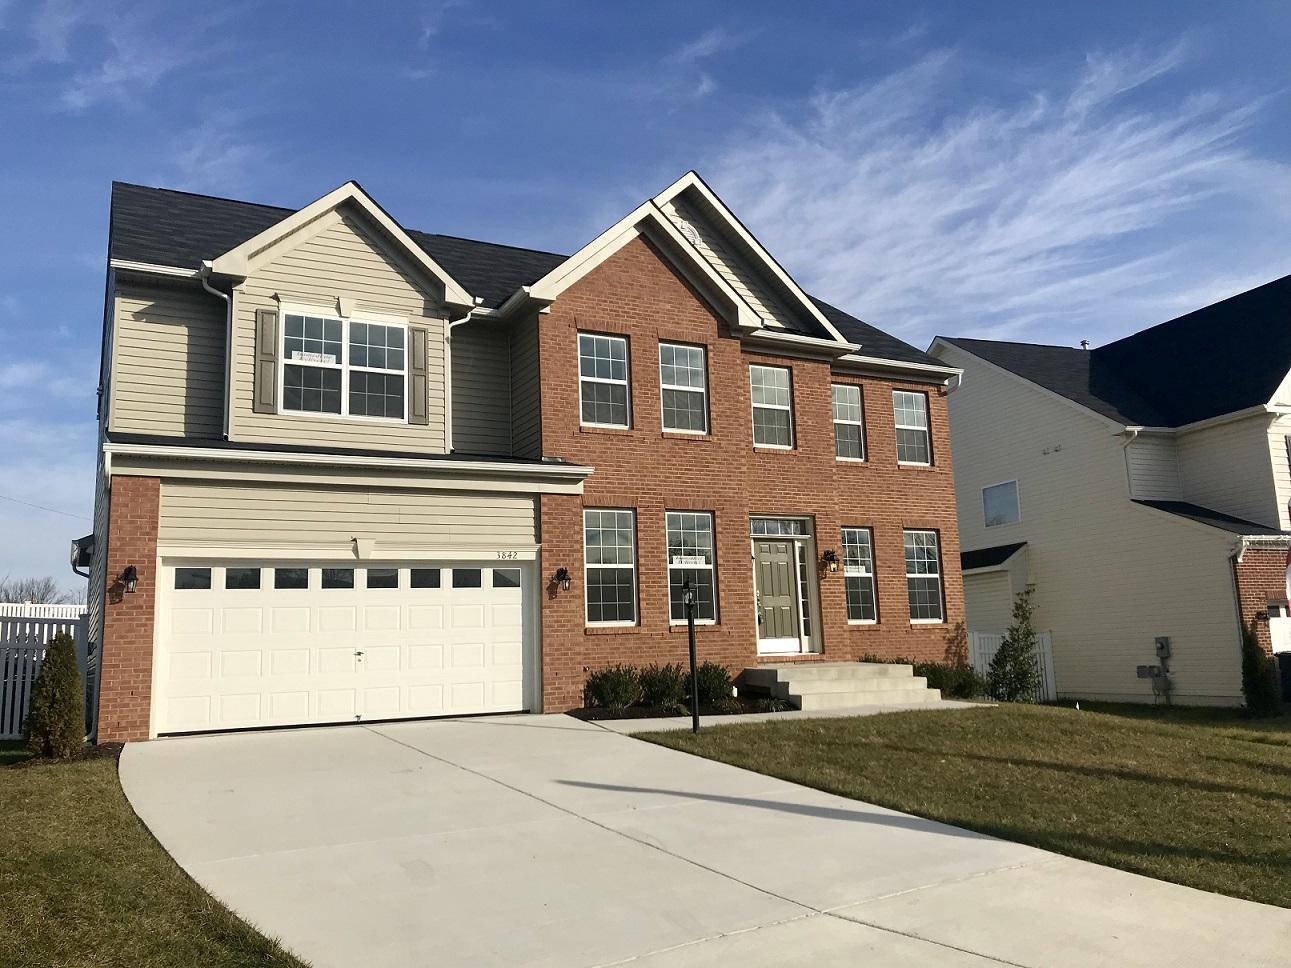 Clarkes Crossing By Nvp Inc New Homes For Sale Woodbridge Va